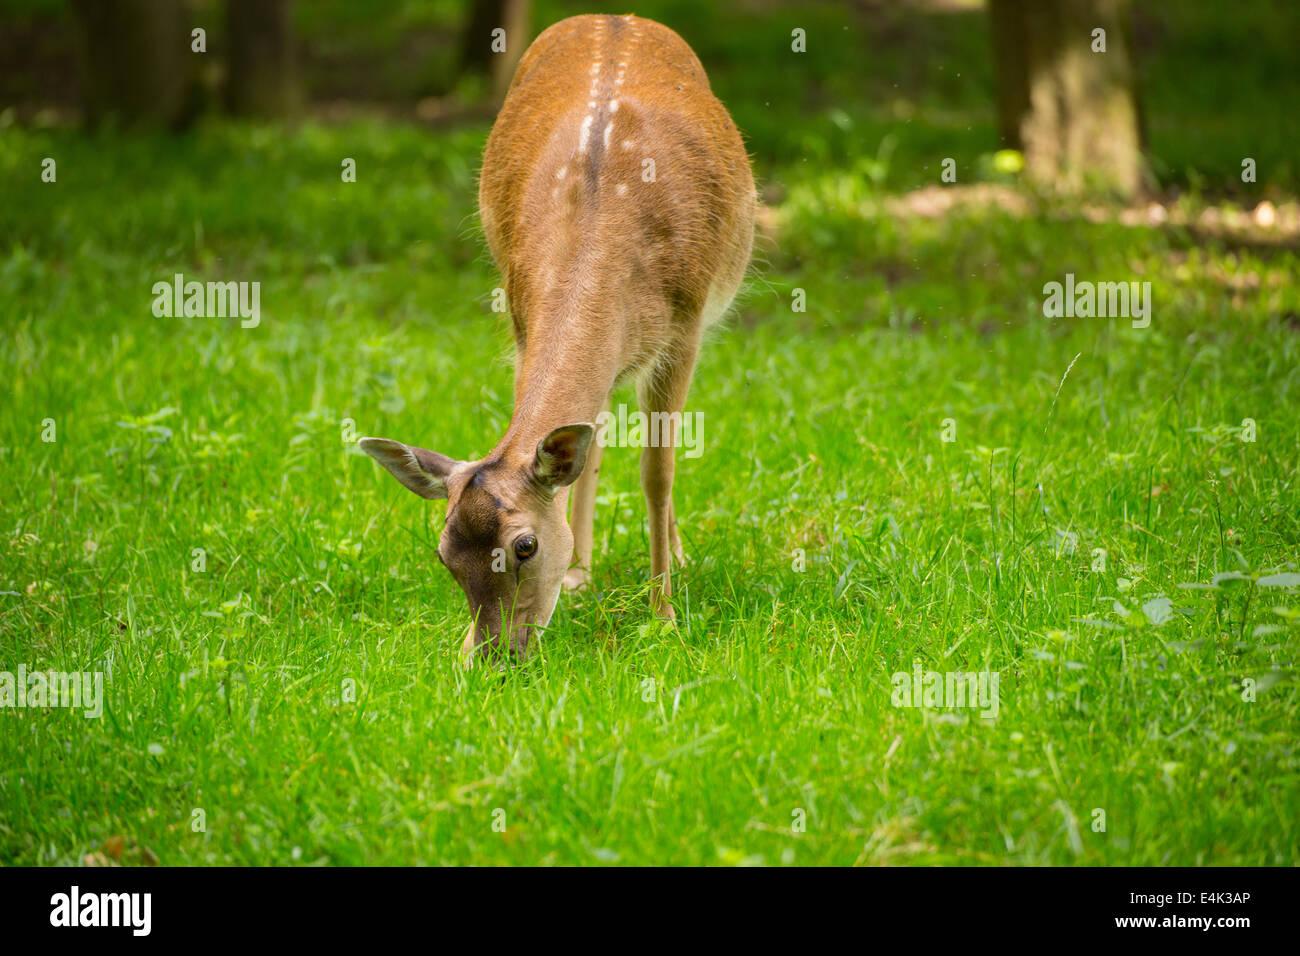 Fallow deer when grazing on green meadow grassland in forest in summer Stock Photo